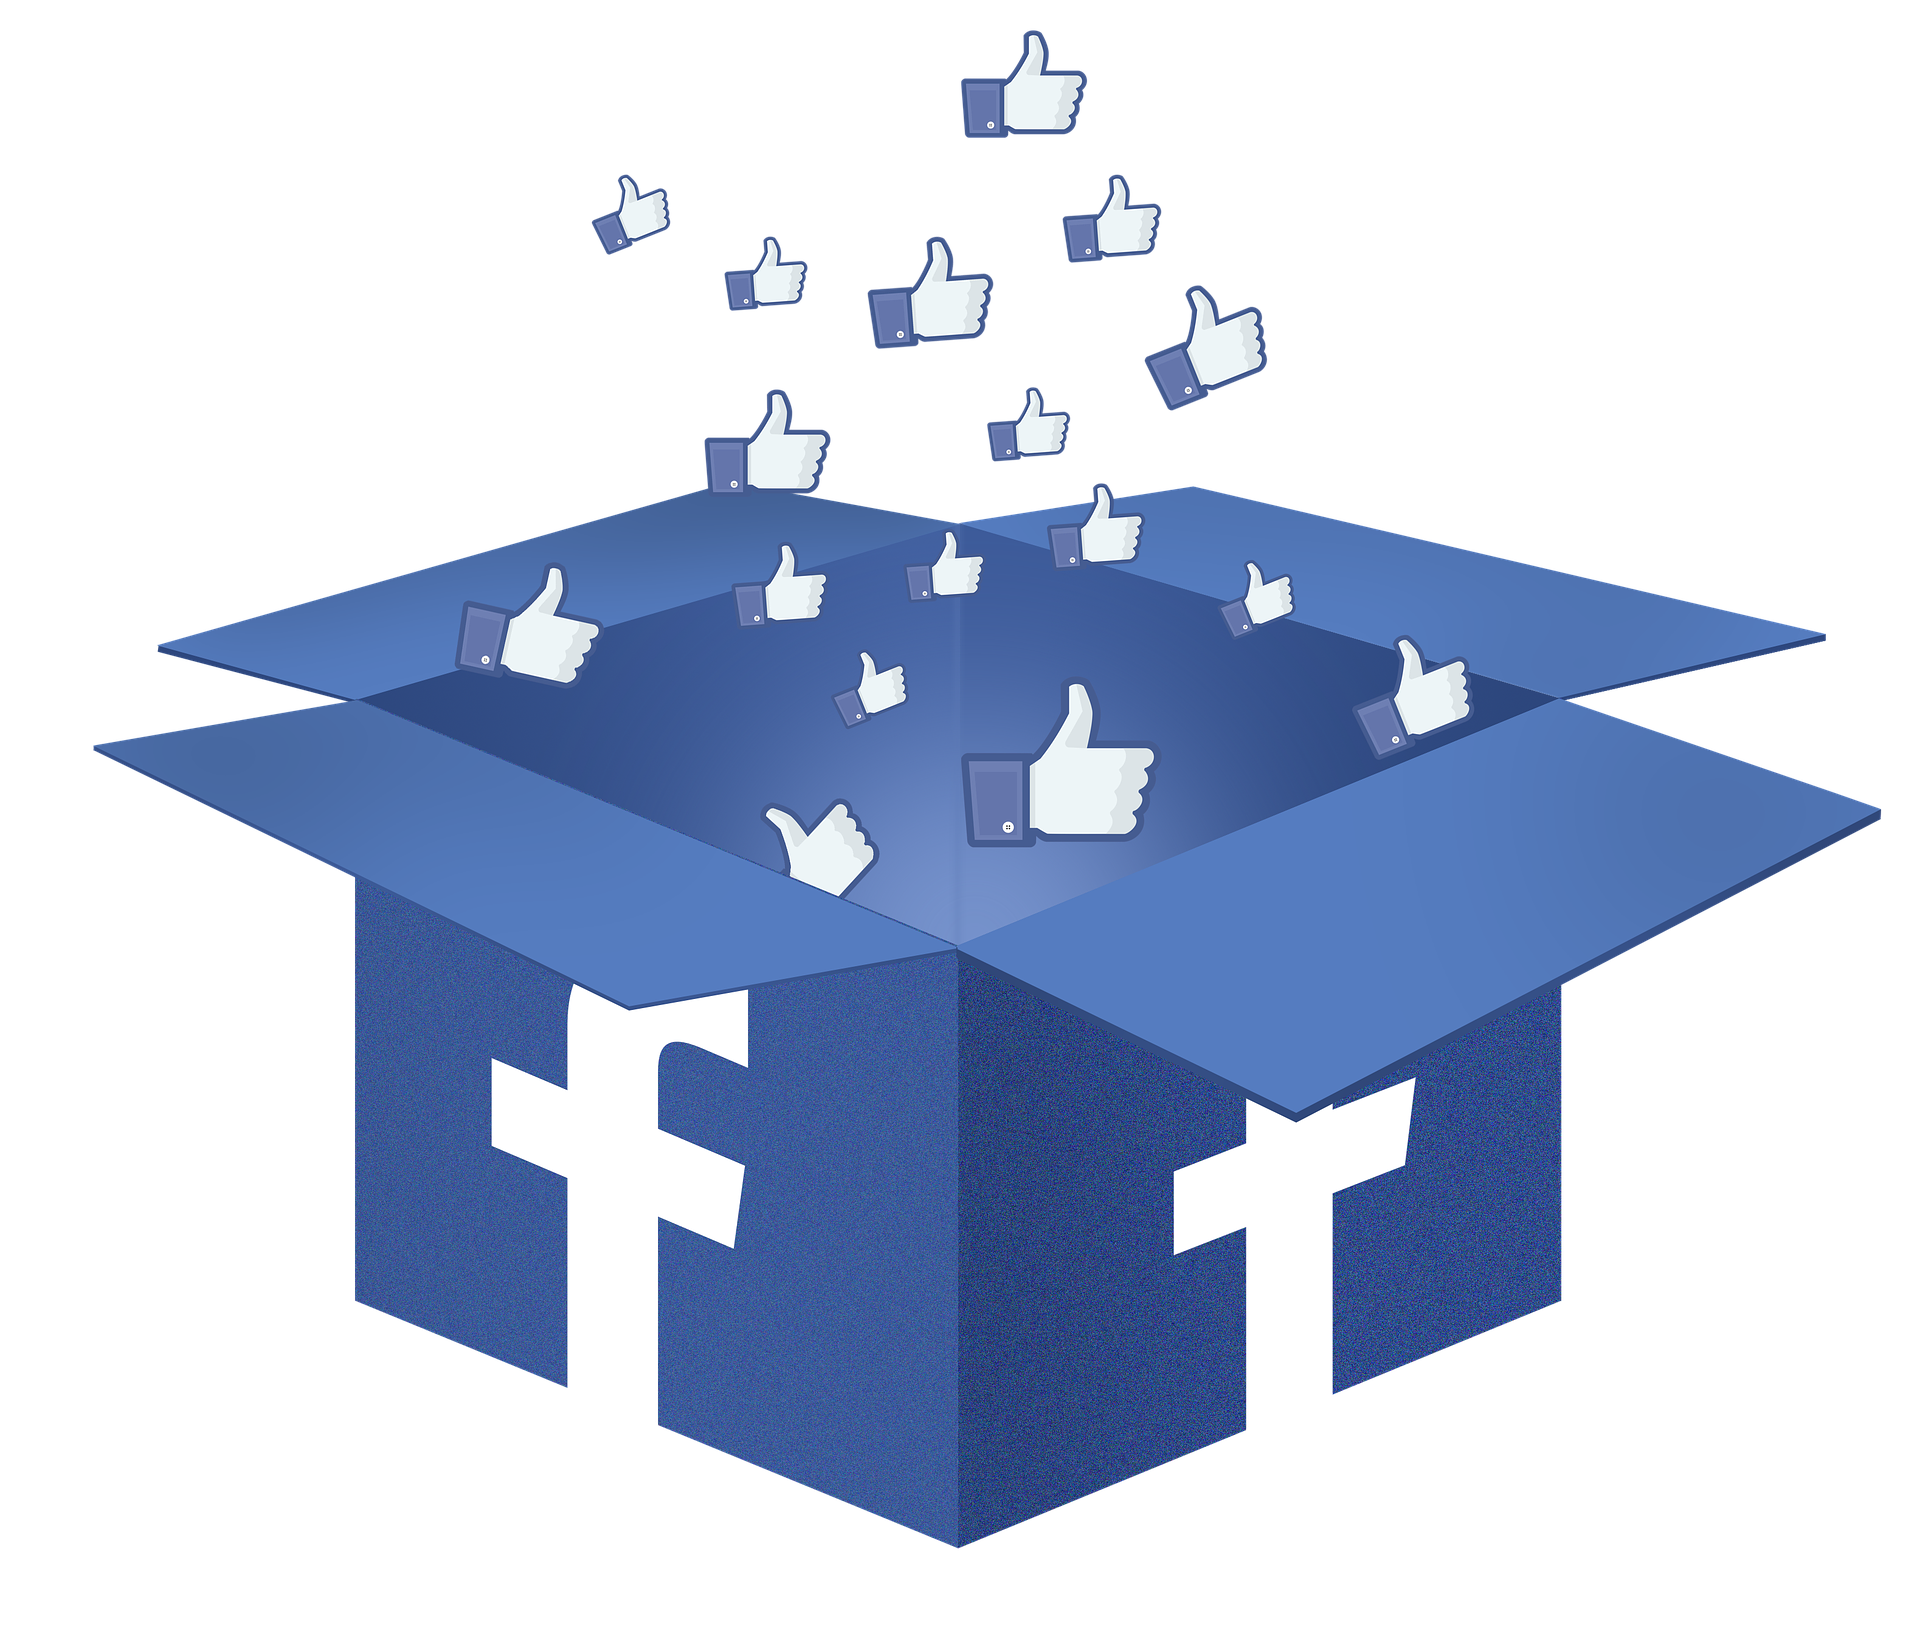 facebook-box-1334045_1920.png